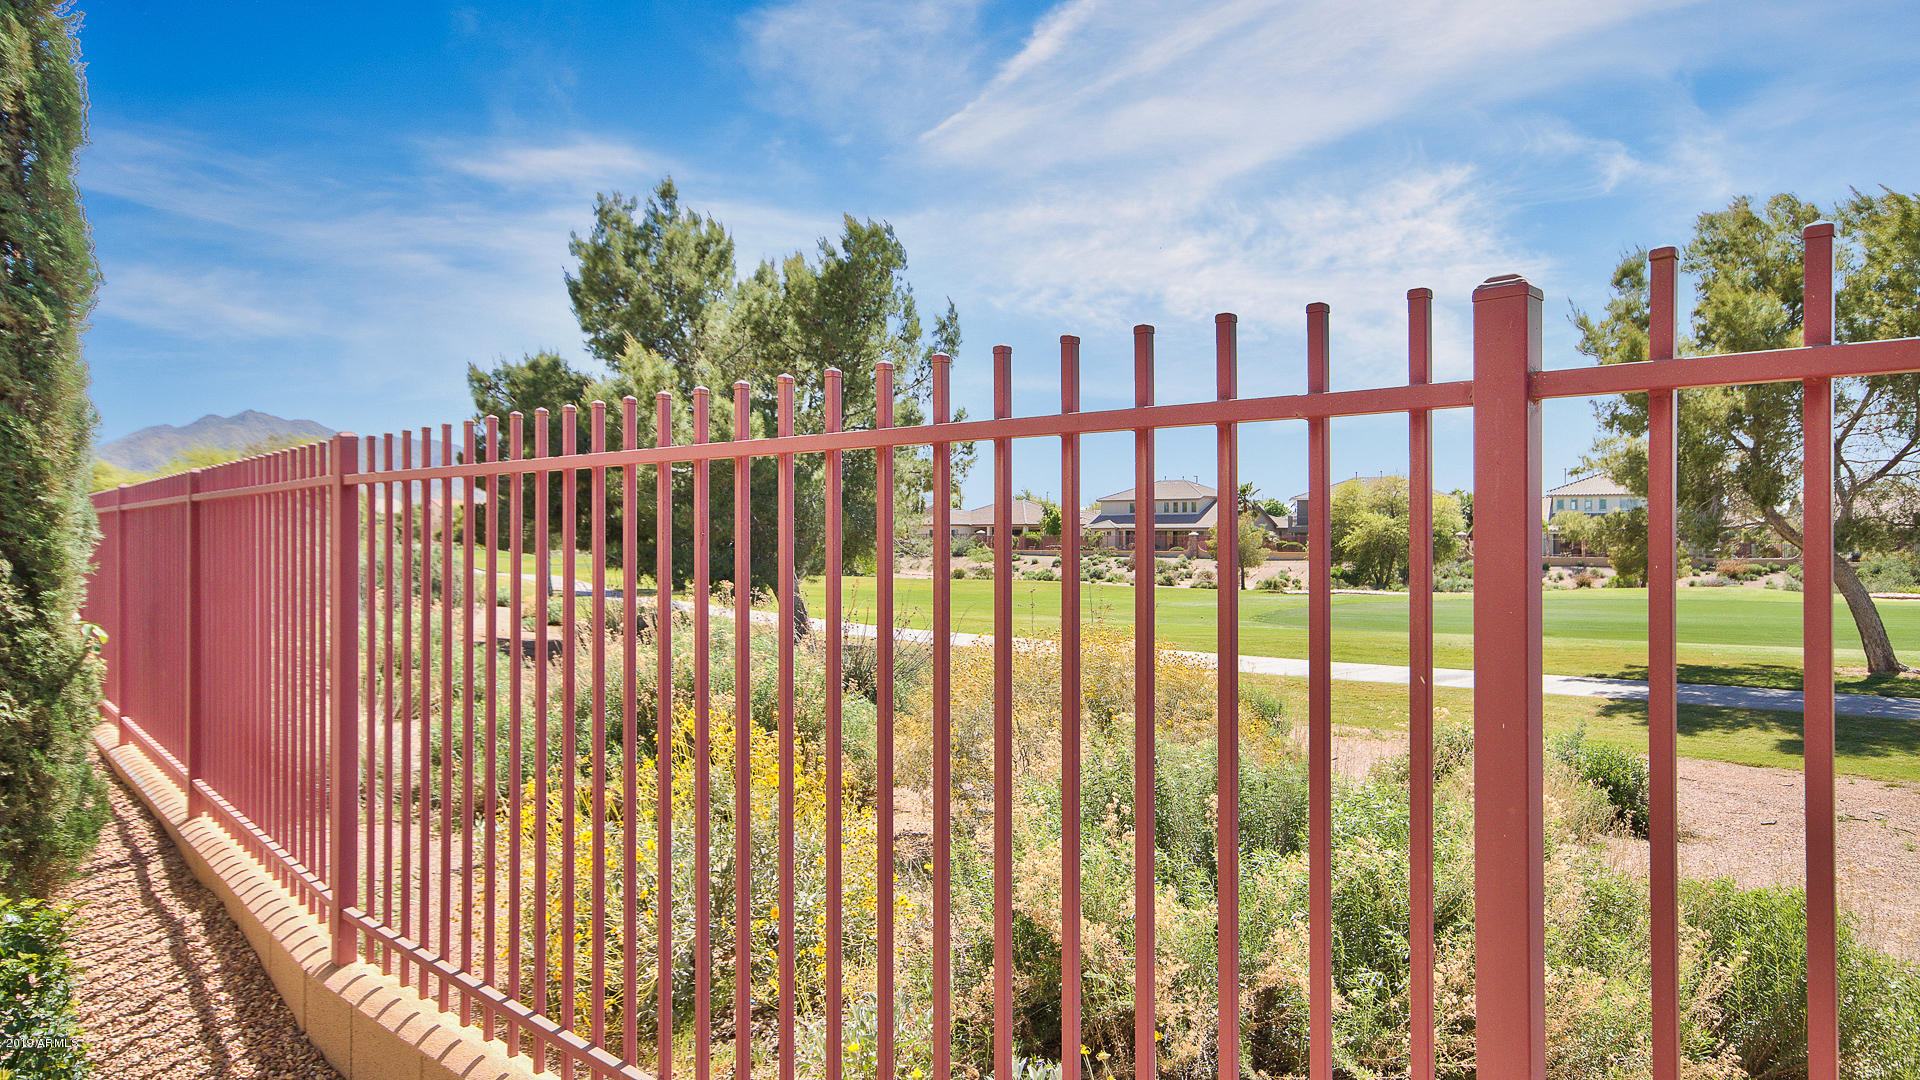 MLS 5910385 6788 S JACQUELINE Way, Gilbert, AZ 85298 Golf Course Lots